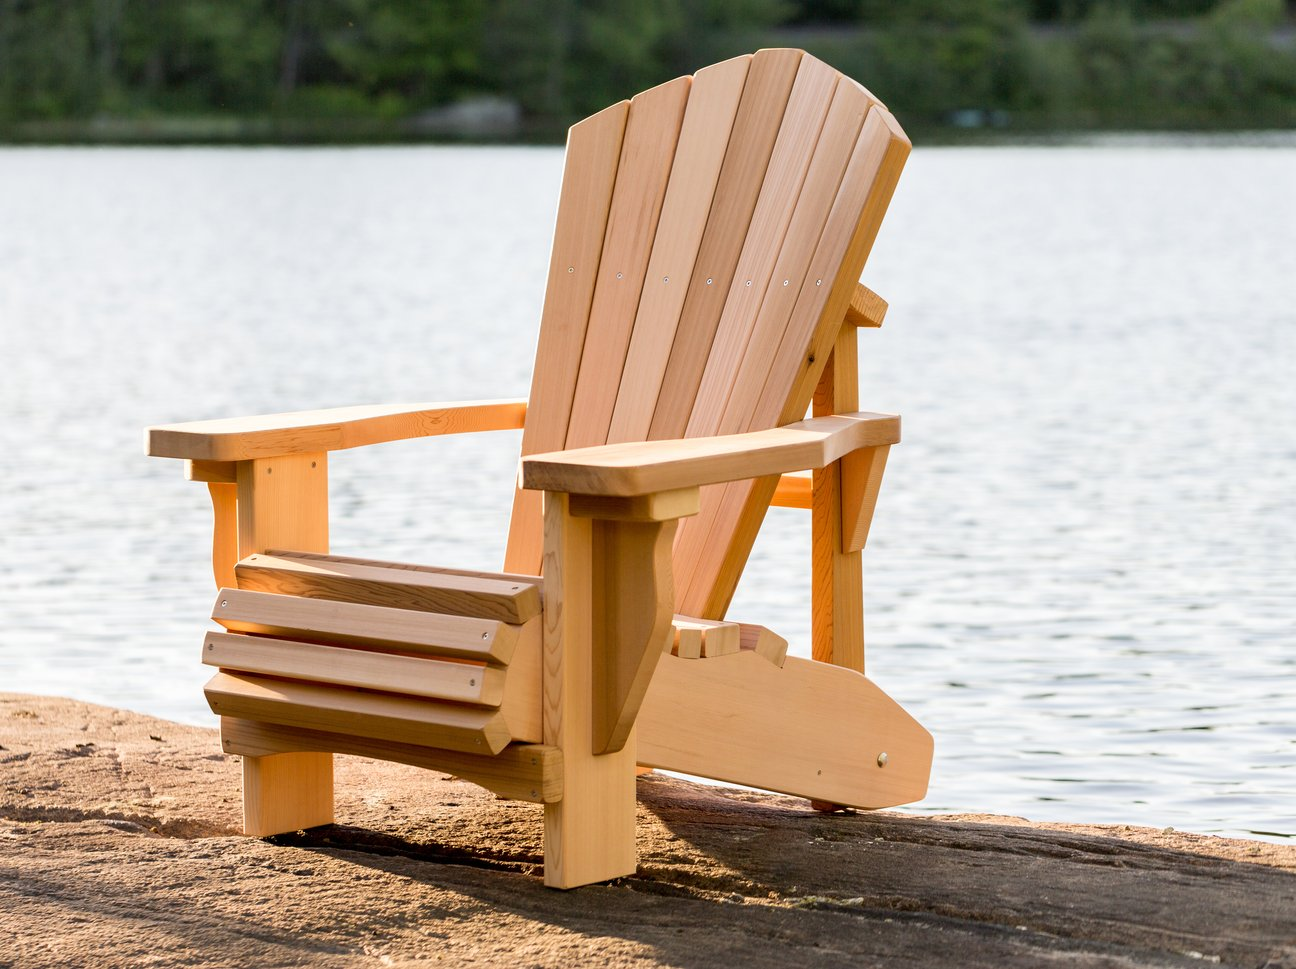 Muskoka Chair Company- Muskoka chair beside lake